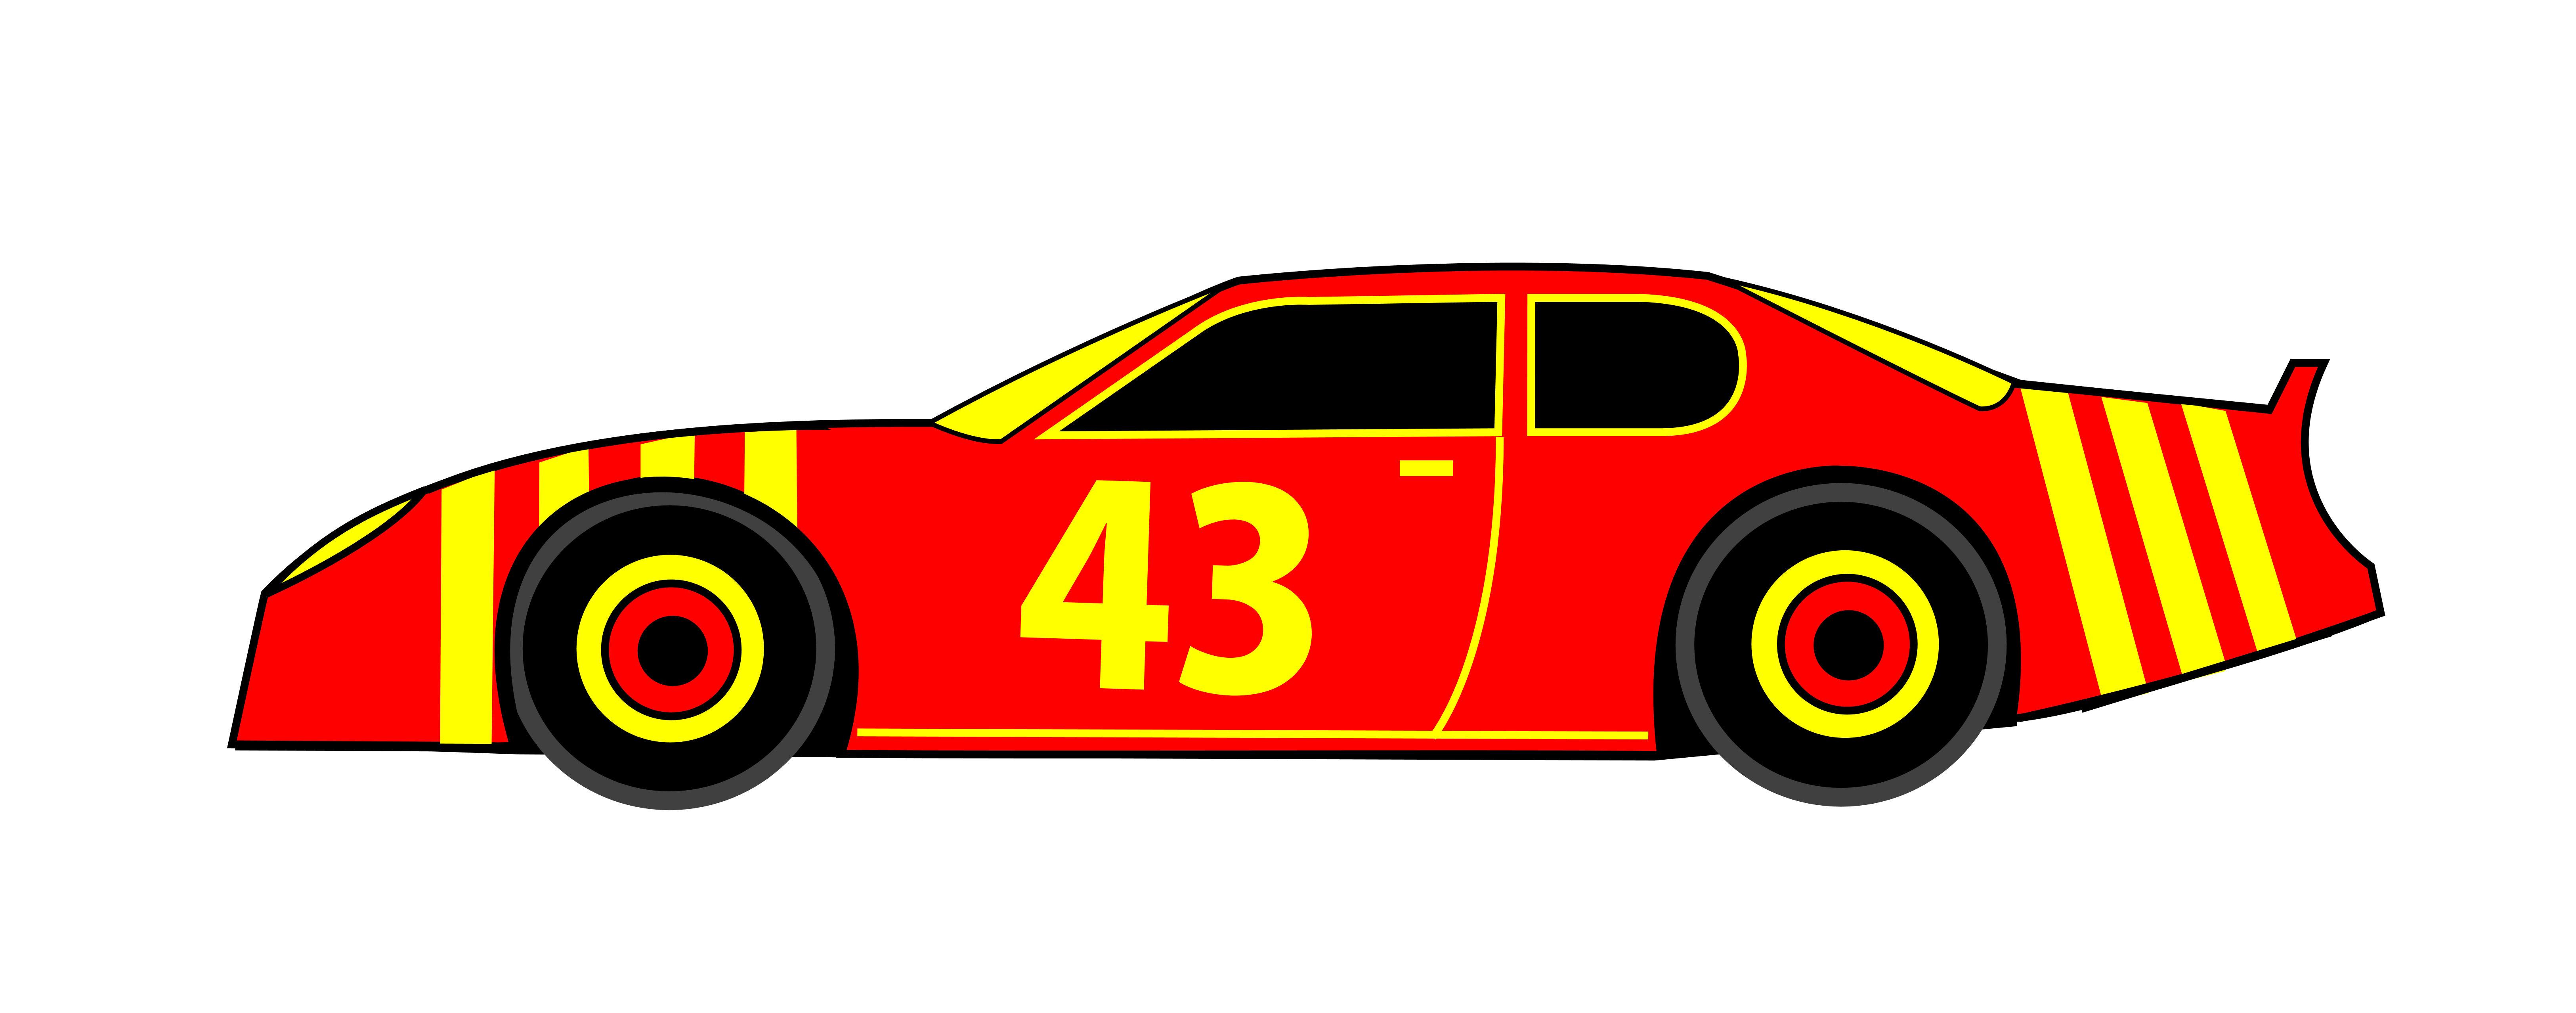 Free clipart nascar cars.